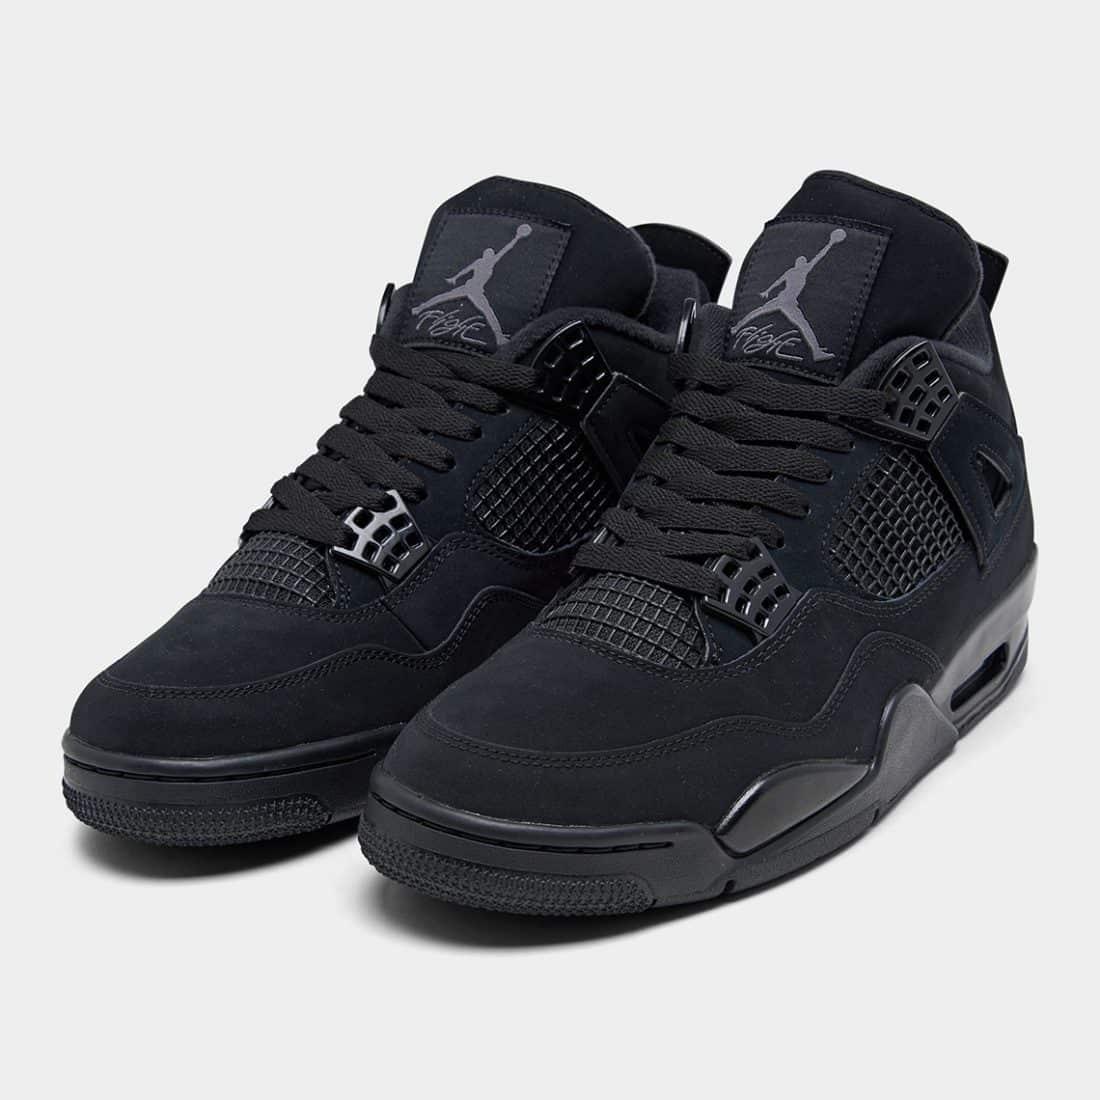 Air Jordan 4 Black Cat - Le Site de la Sneaker